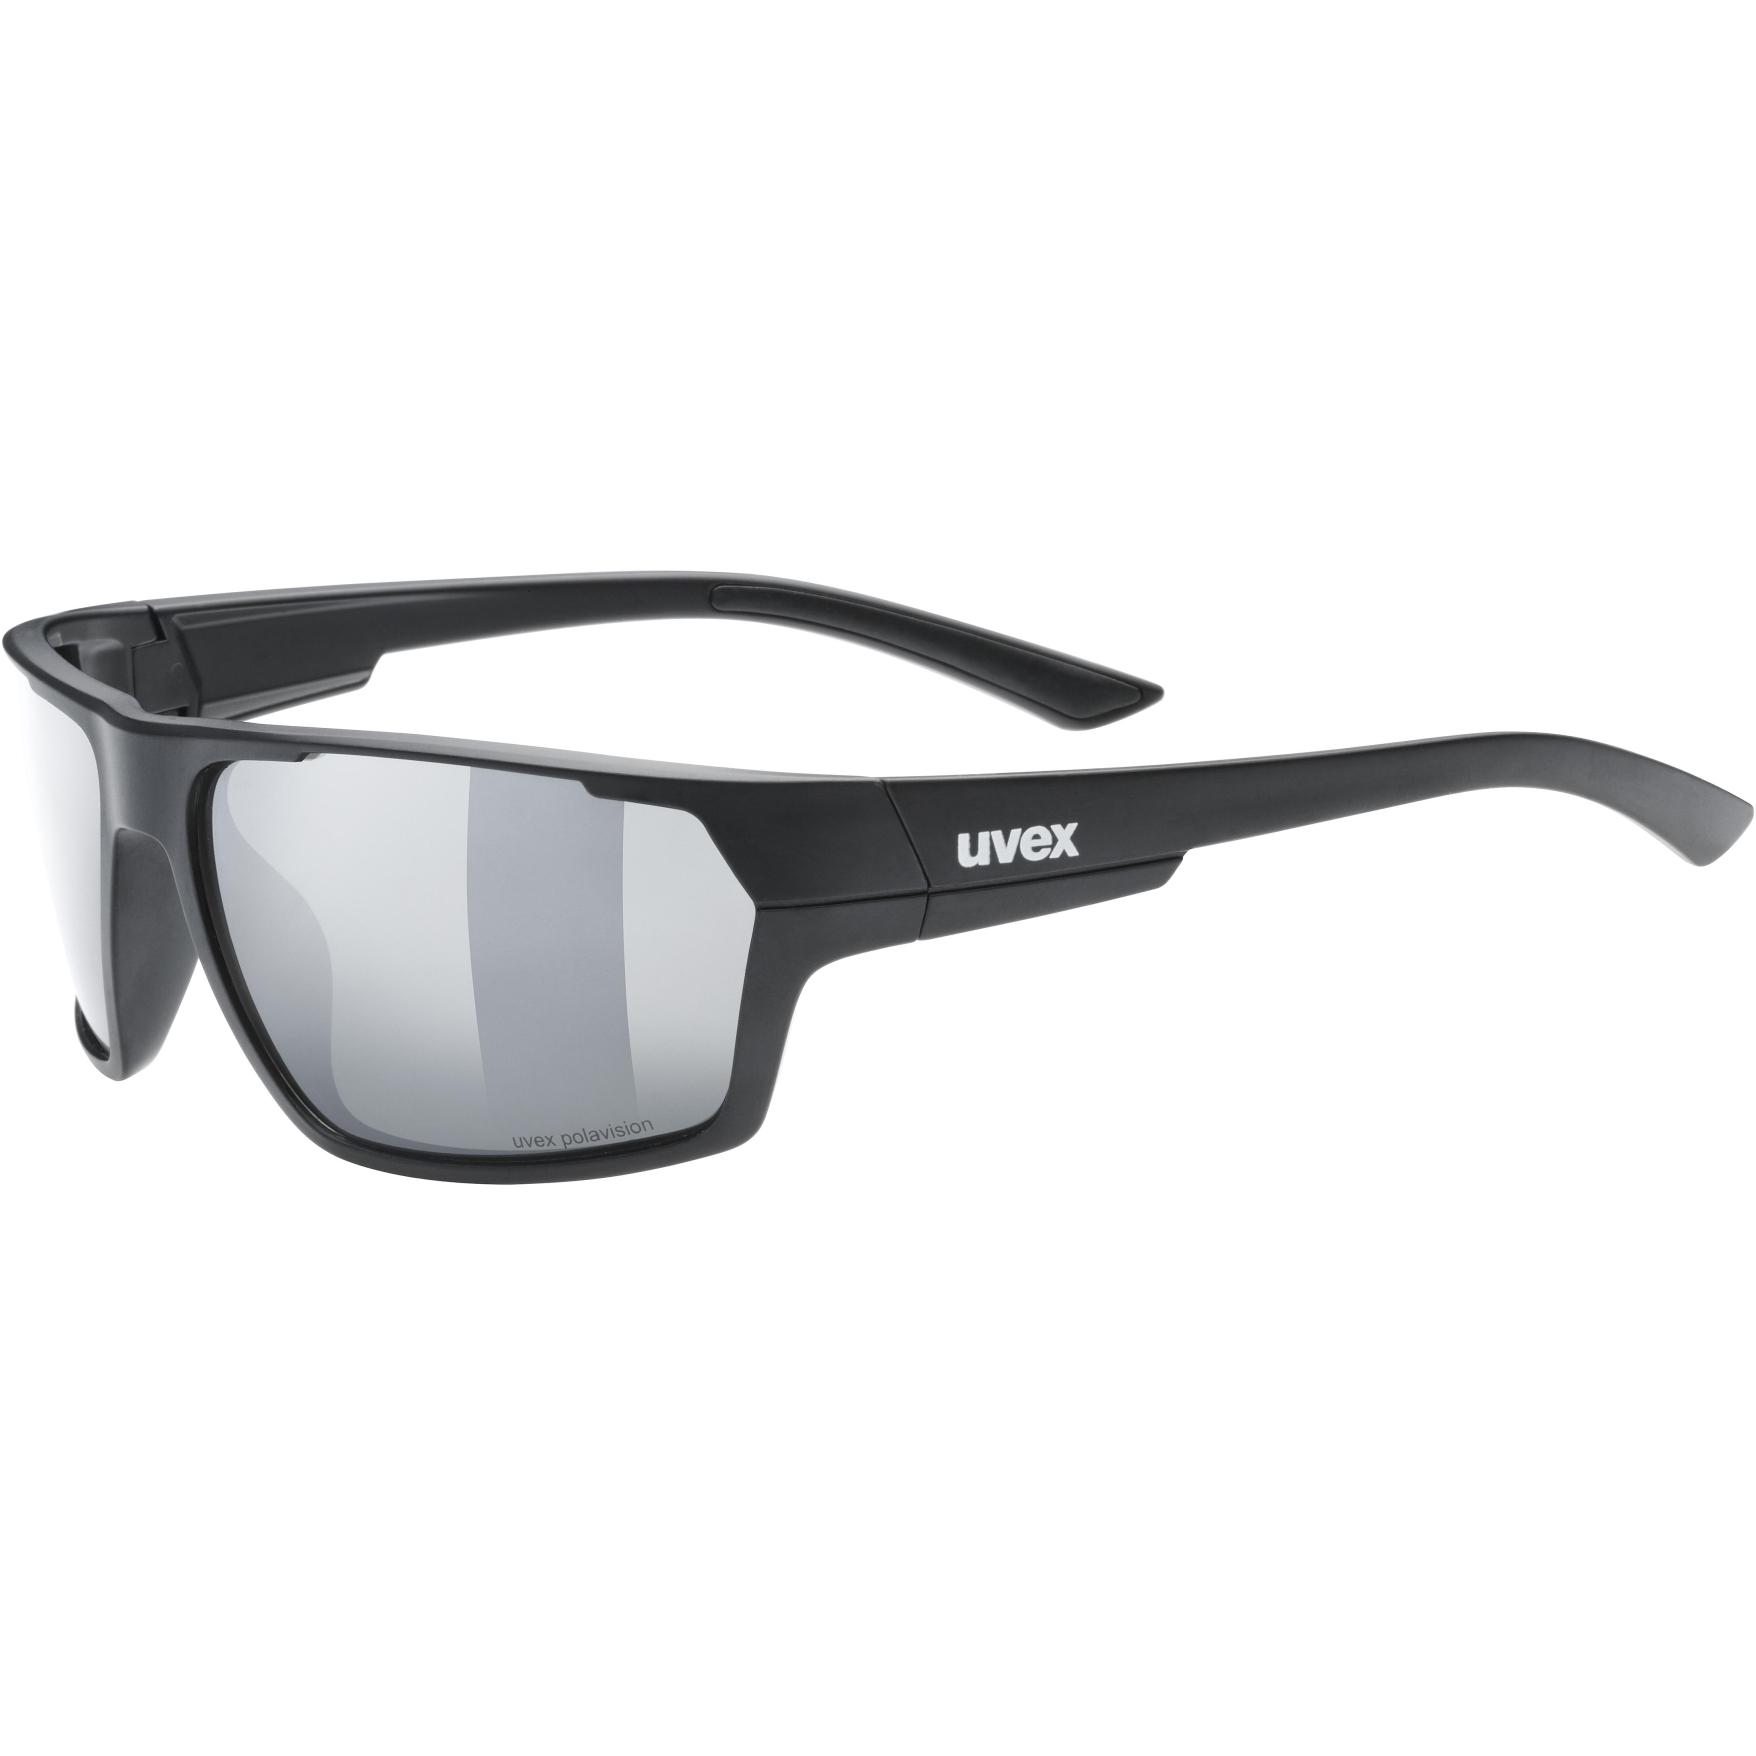 Uvex sportstyle 233 P Glasses - black mat/polavision litemirror silver